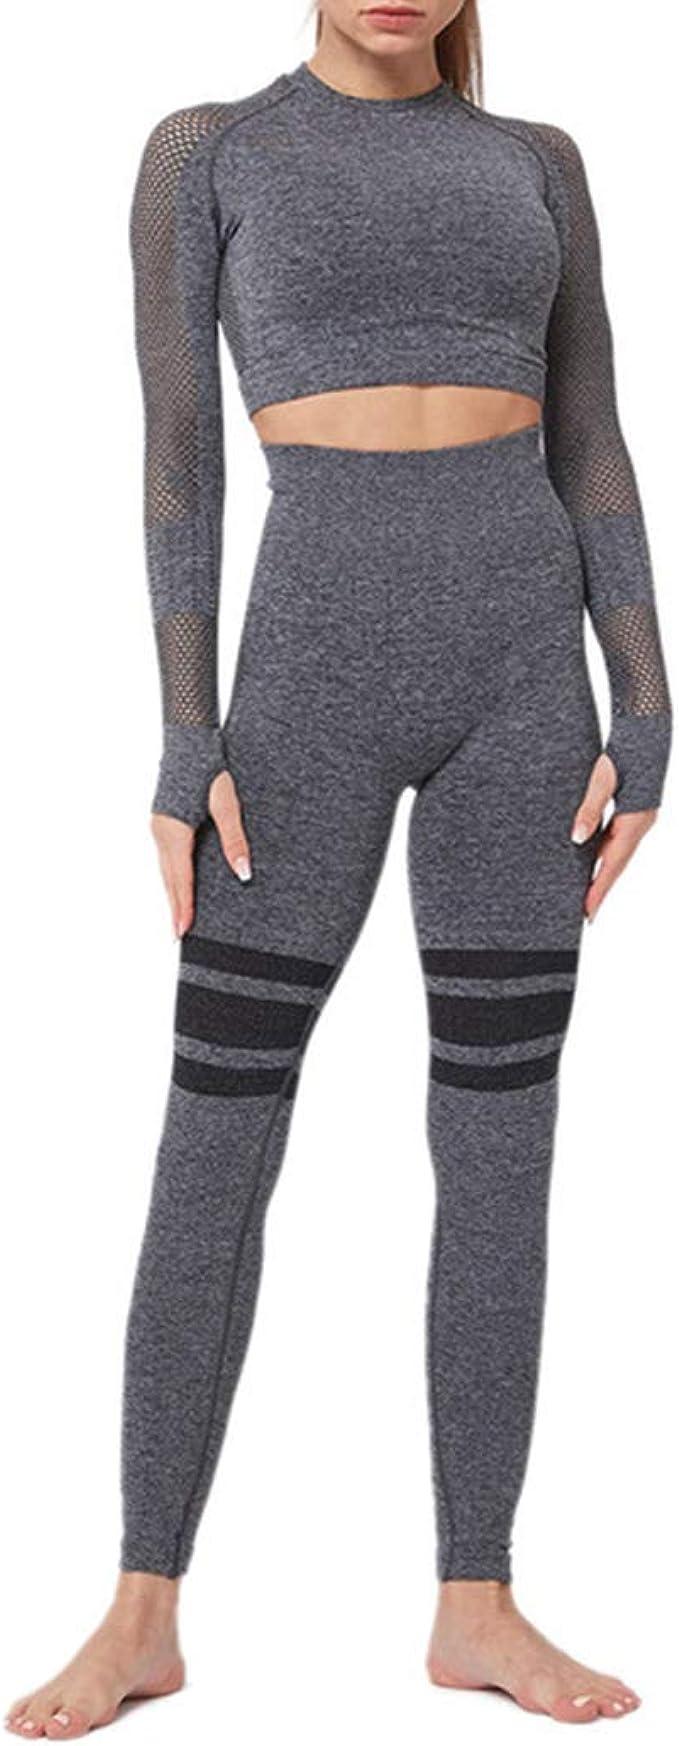 Damen Fitness Set Sport Zweiteiler Tanktop Leggings Glitzer Slim Stretch 36 S